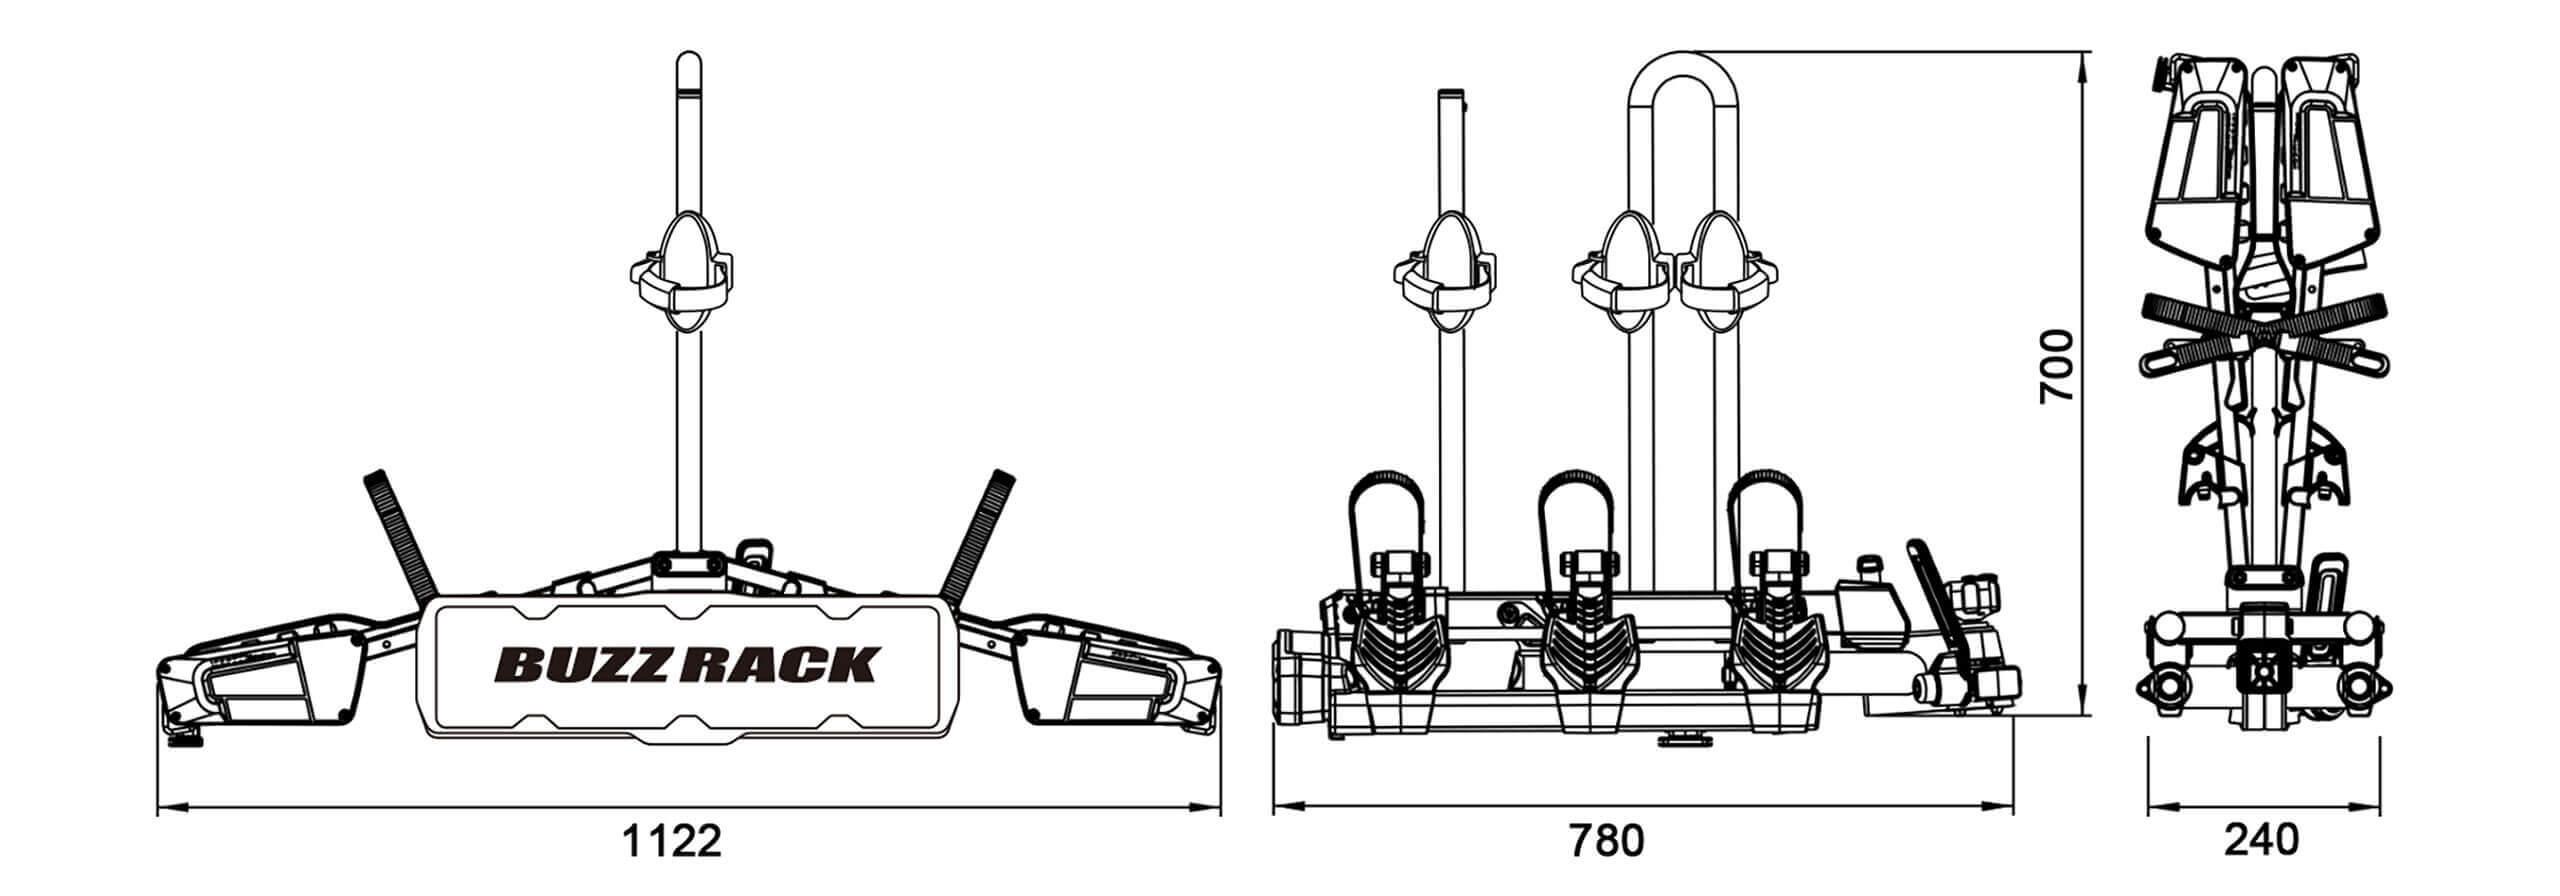 Buzz Rack Eazzy 3 Bike Folding And Tilting Rack No Brp723